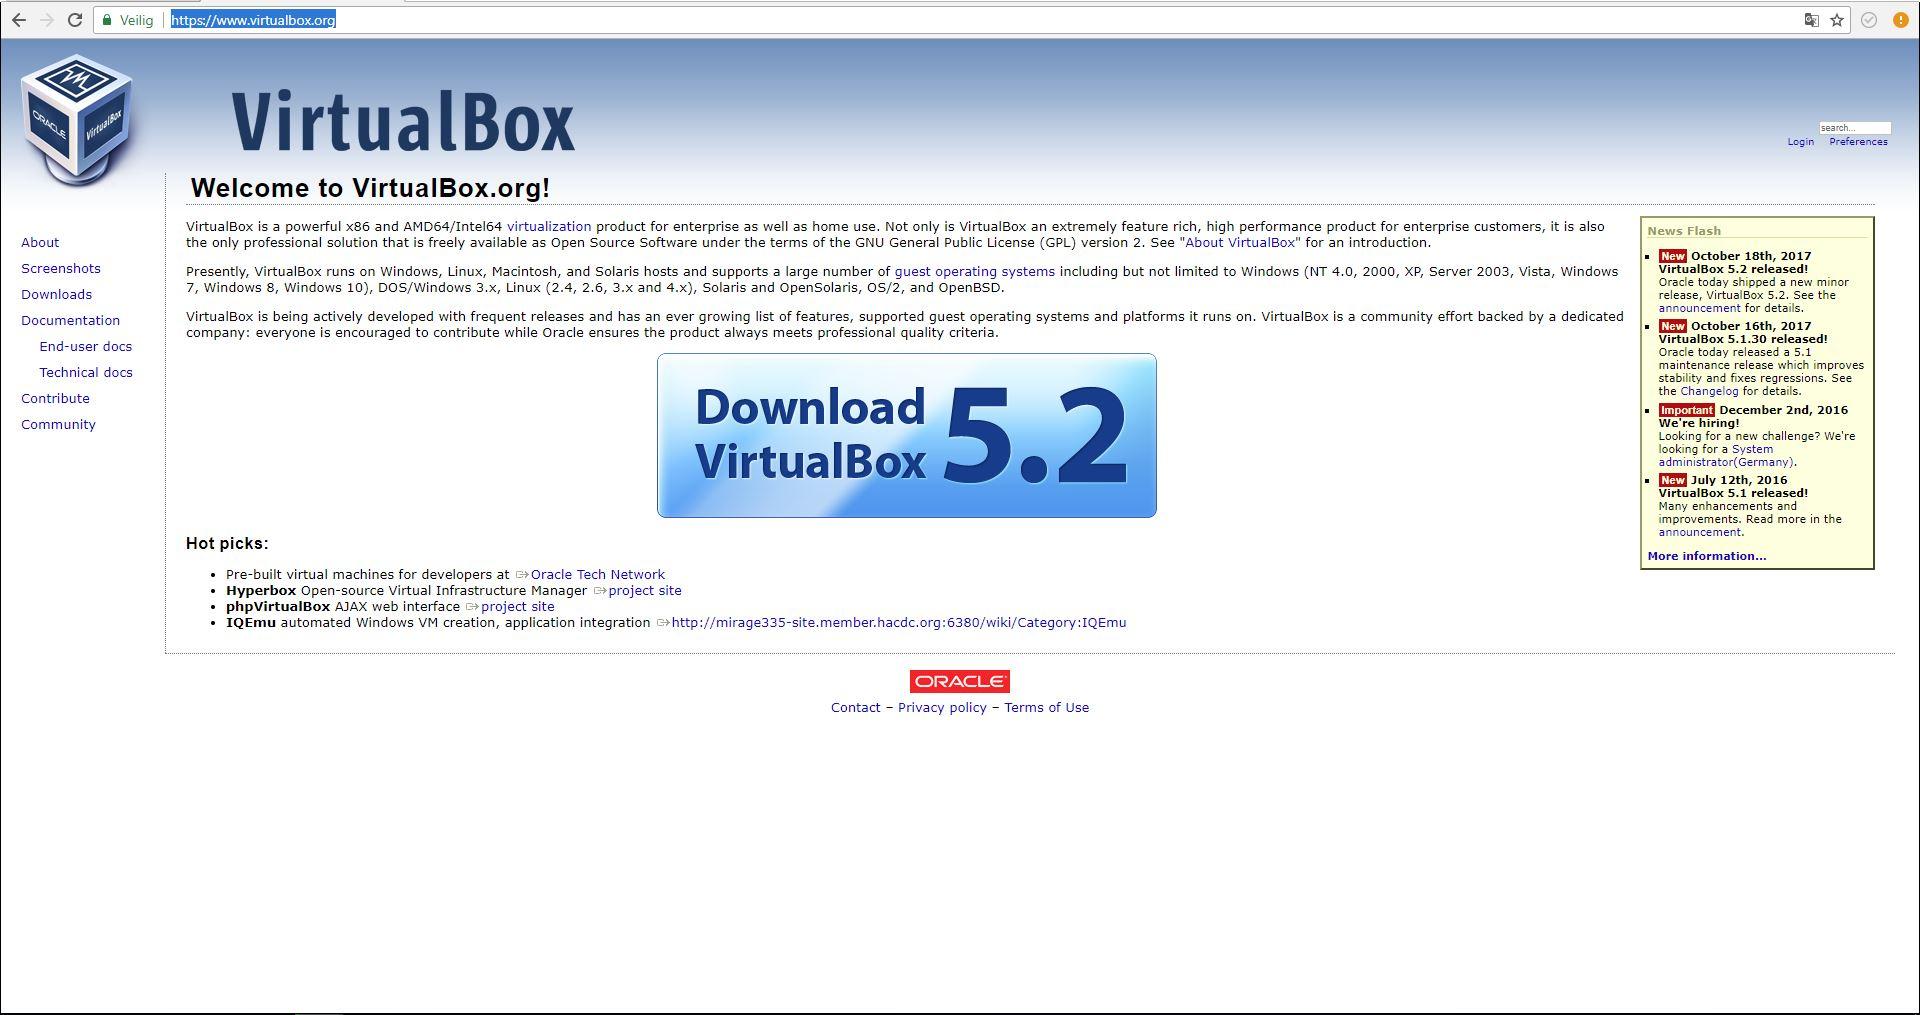 How to install the Hortonworks sandbox on VirtualBox - TalendHowTo